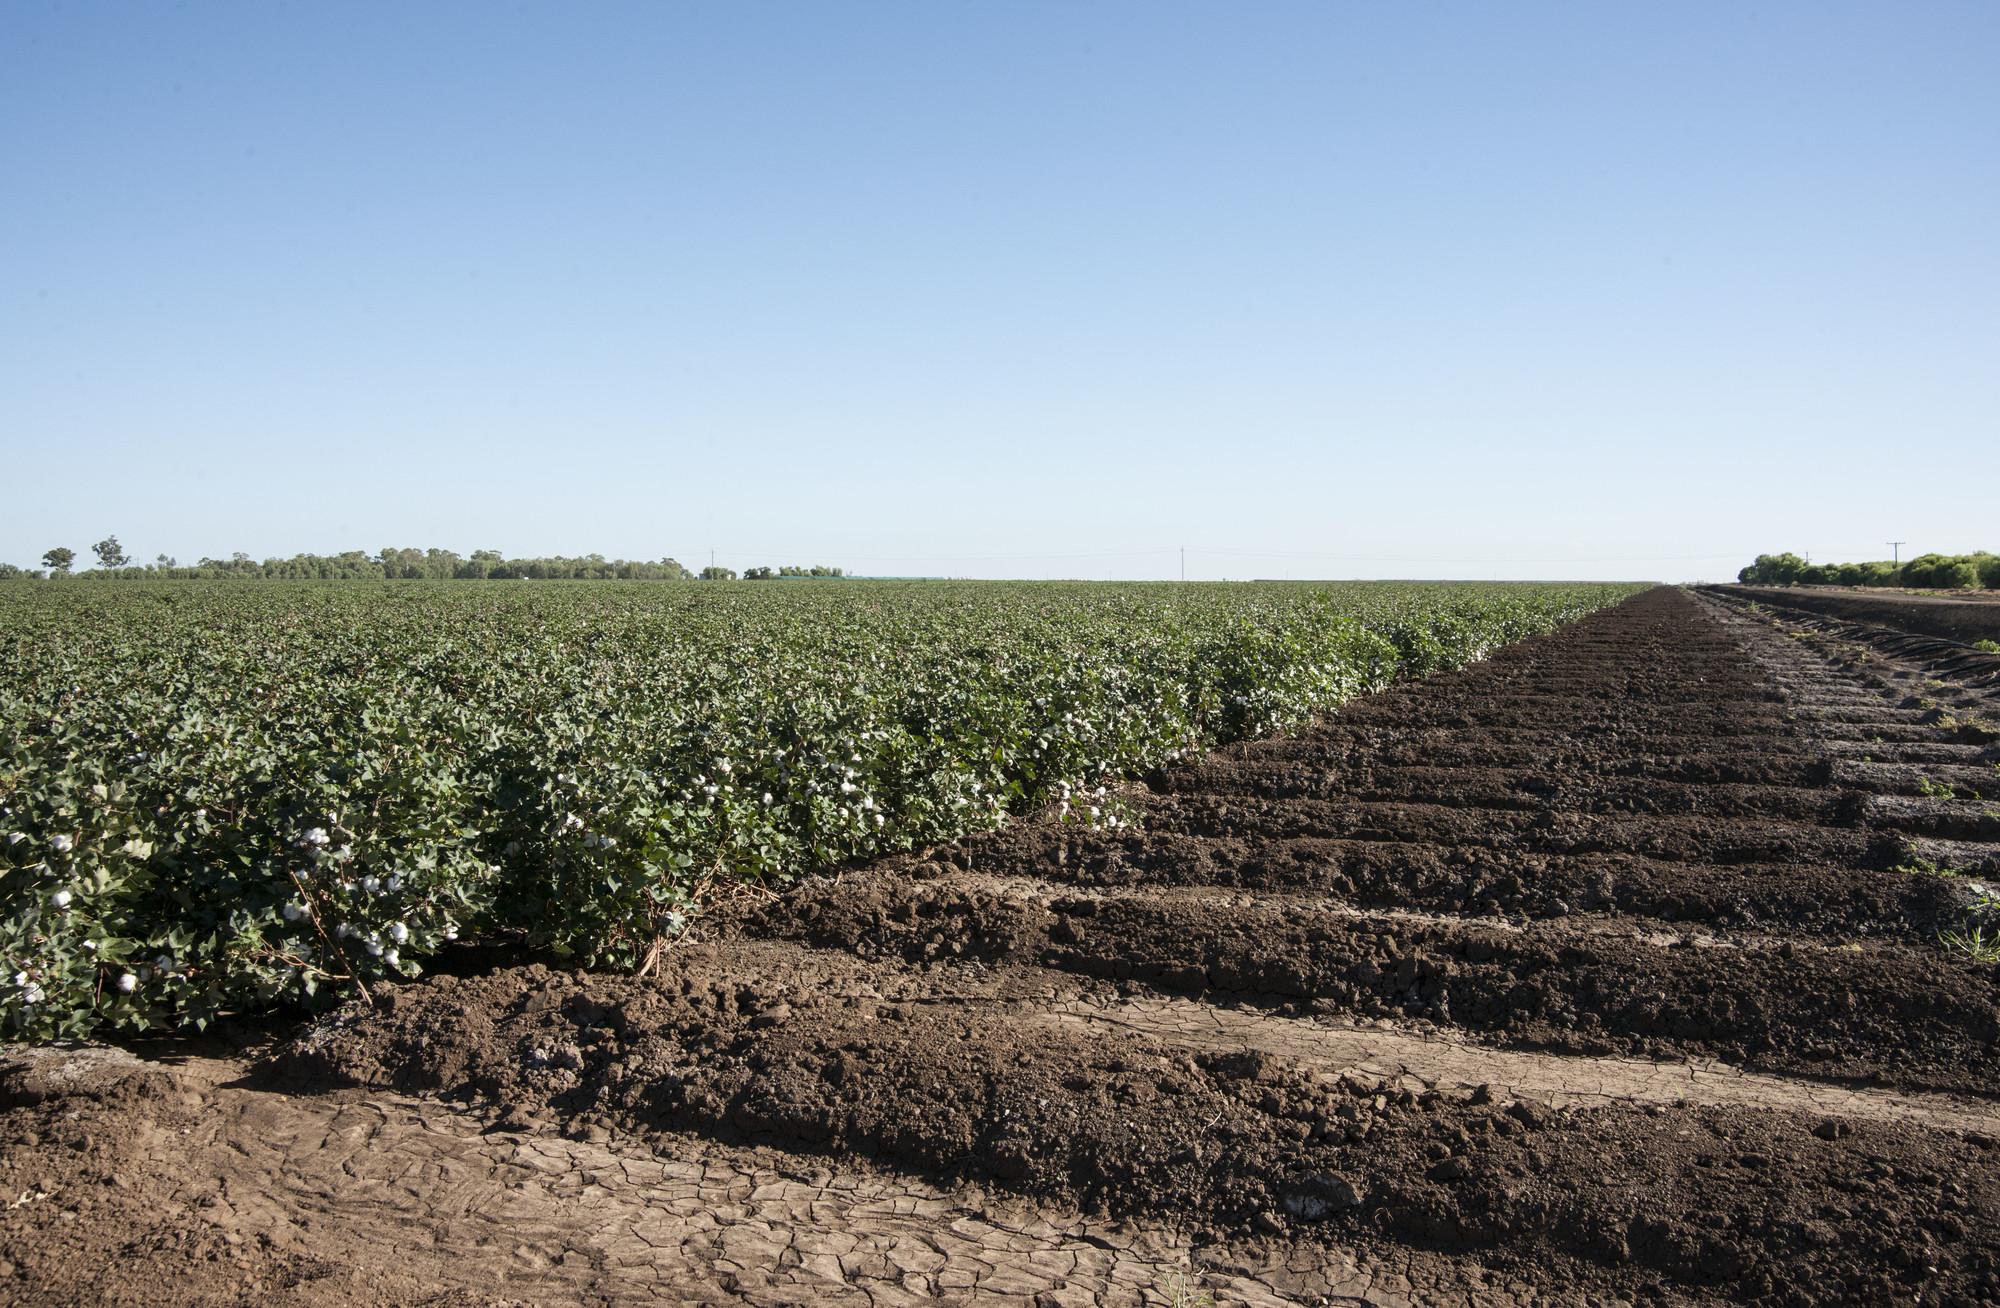 Photo of an irrigated farm field